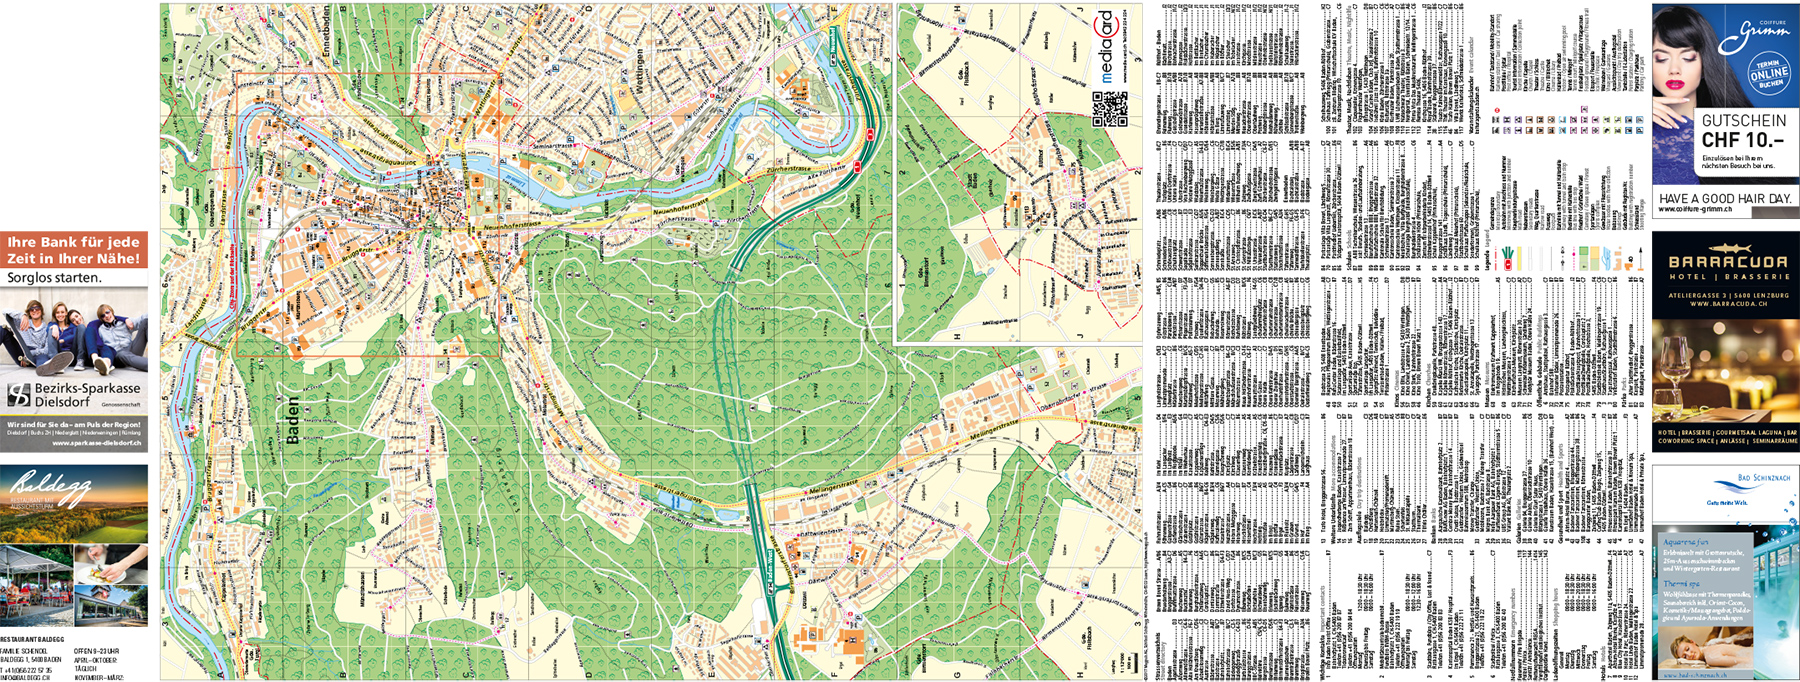 Stadtplan Baden Vorderseite